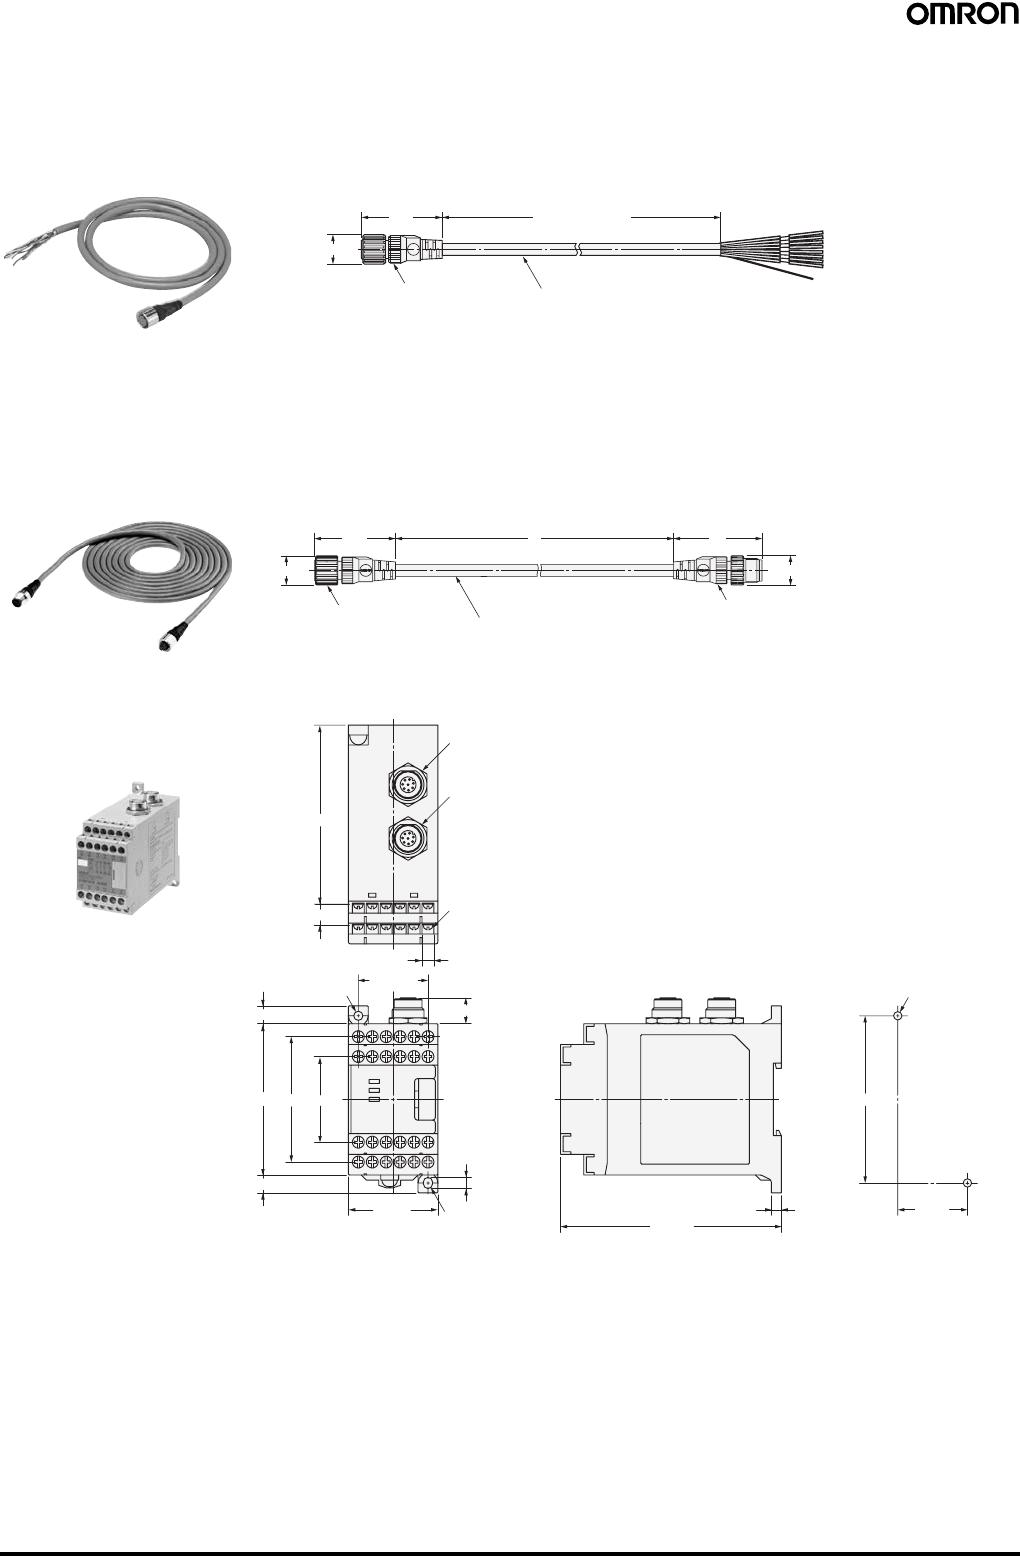 Omron f3sj safety light curtain datasheet 80 safety light curtain type 4 f3sj ver 2 fandeluxe Images